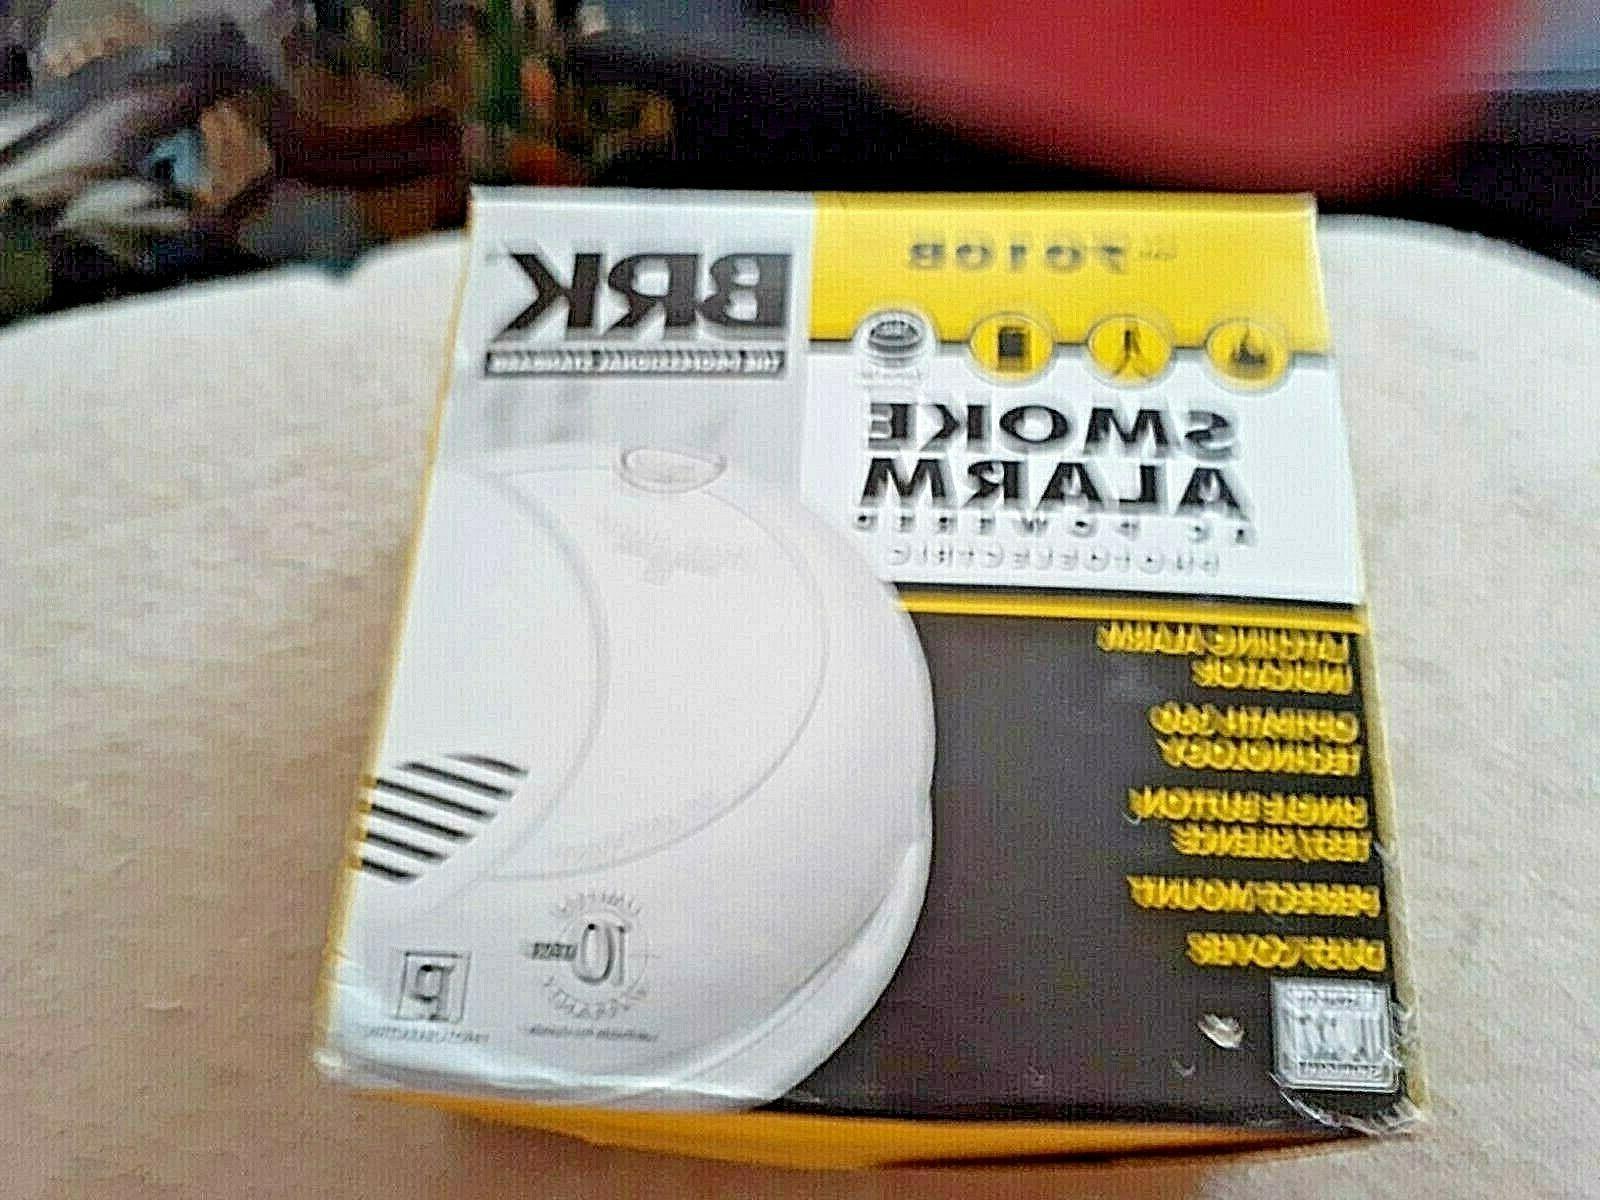 BRK Alert 7010B 120-Volt Detector